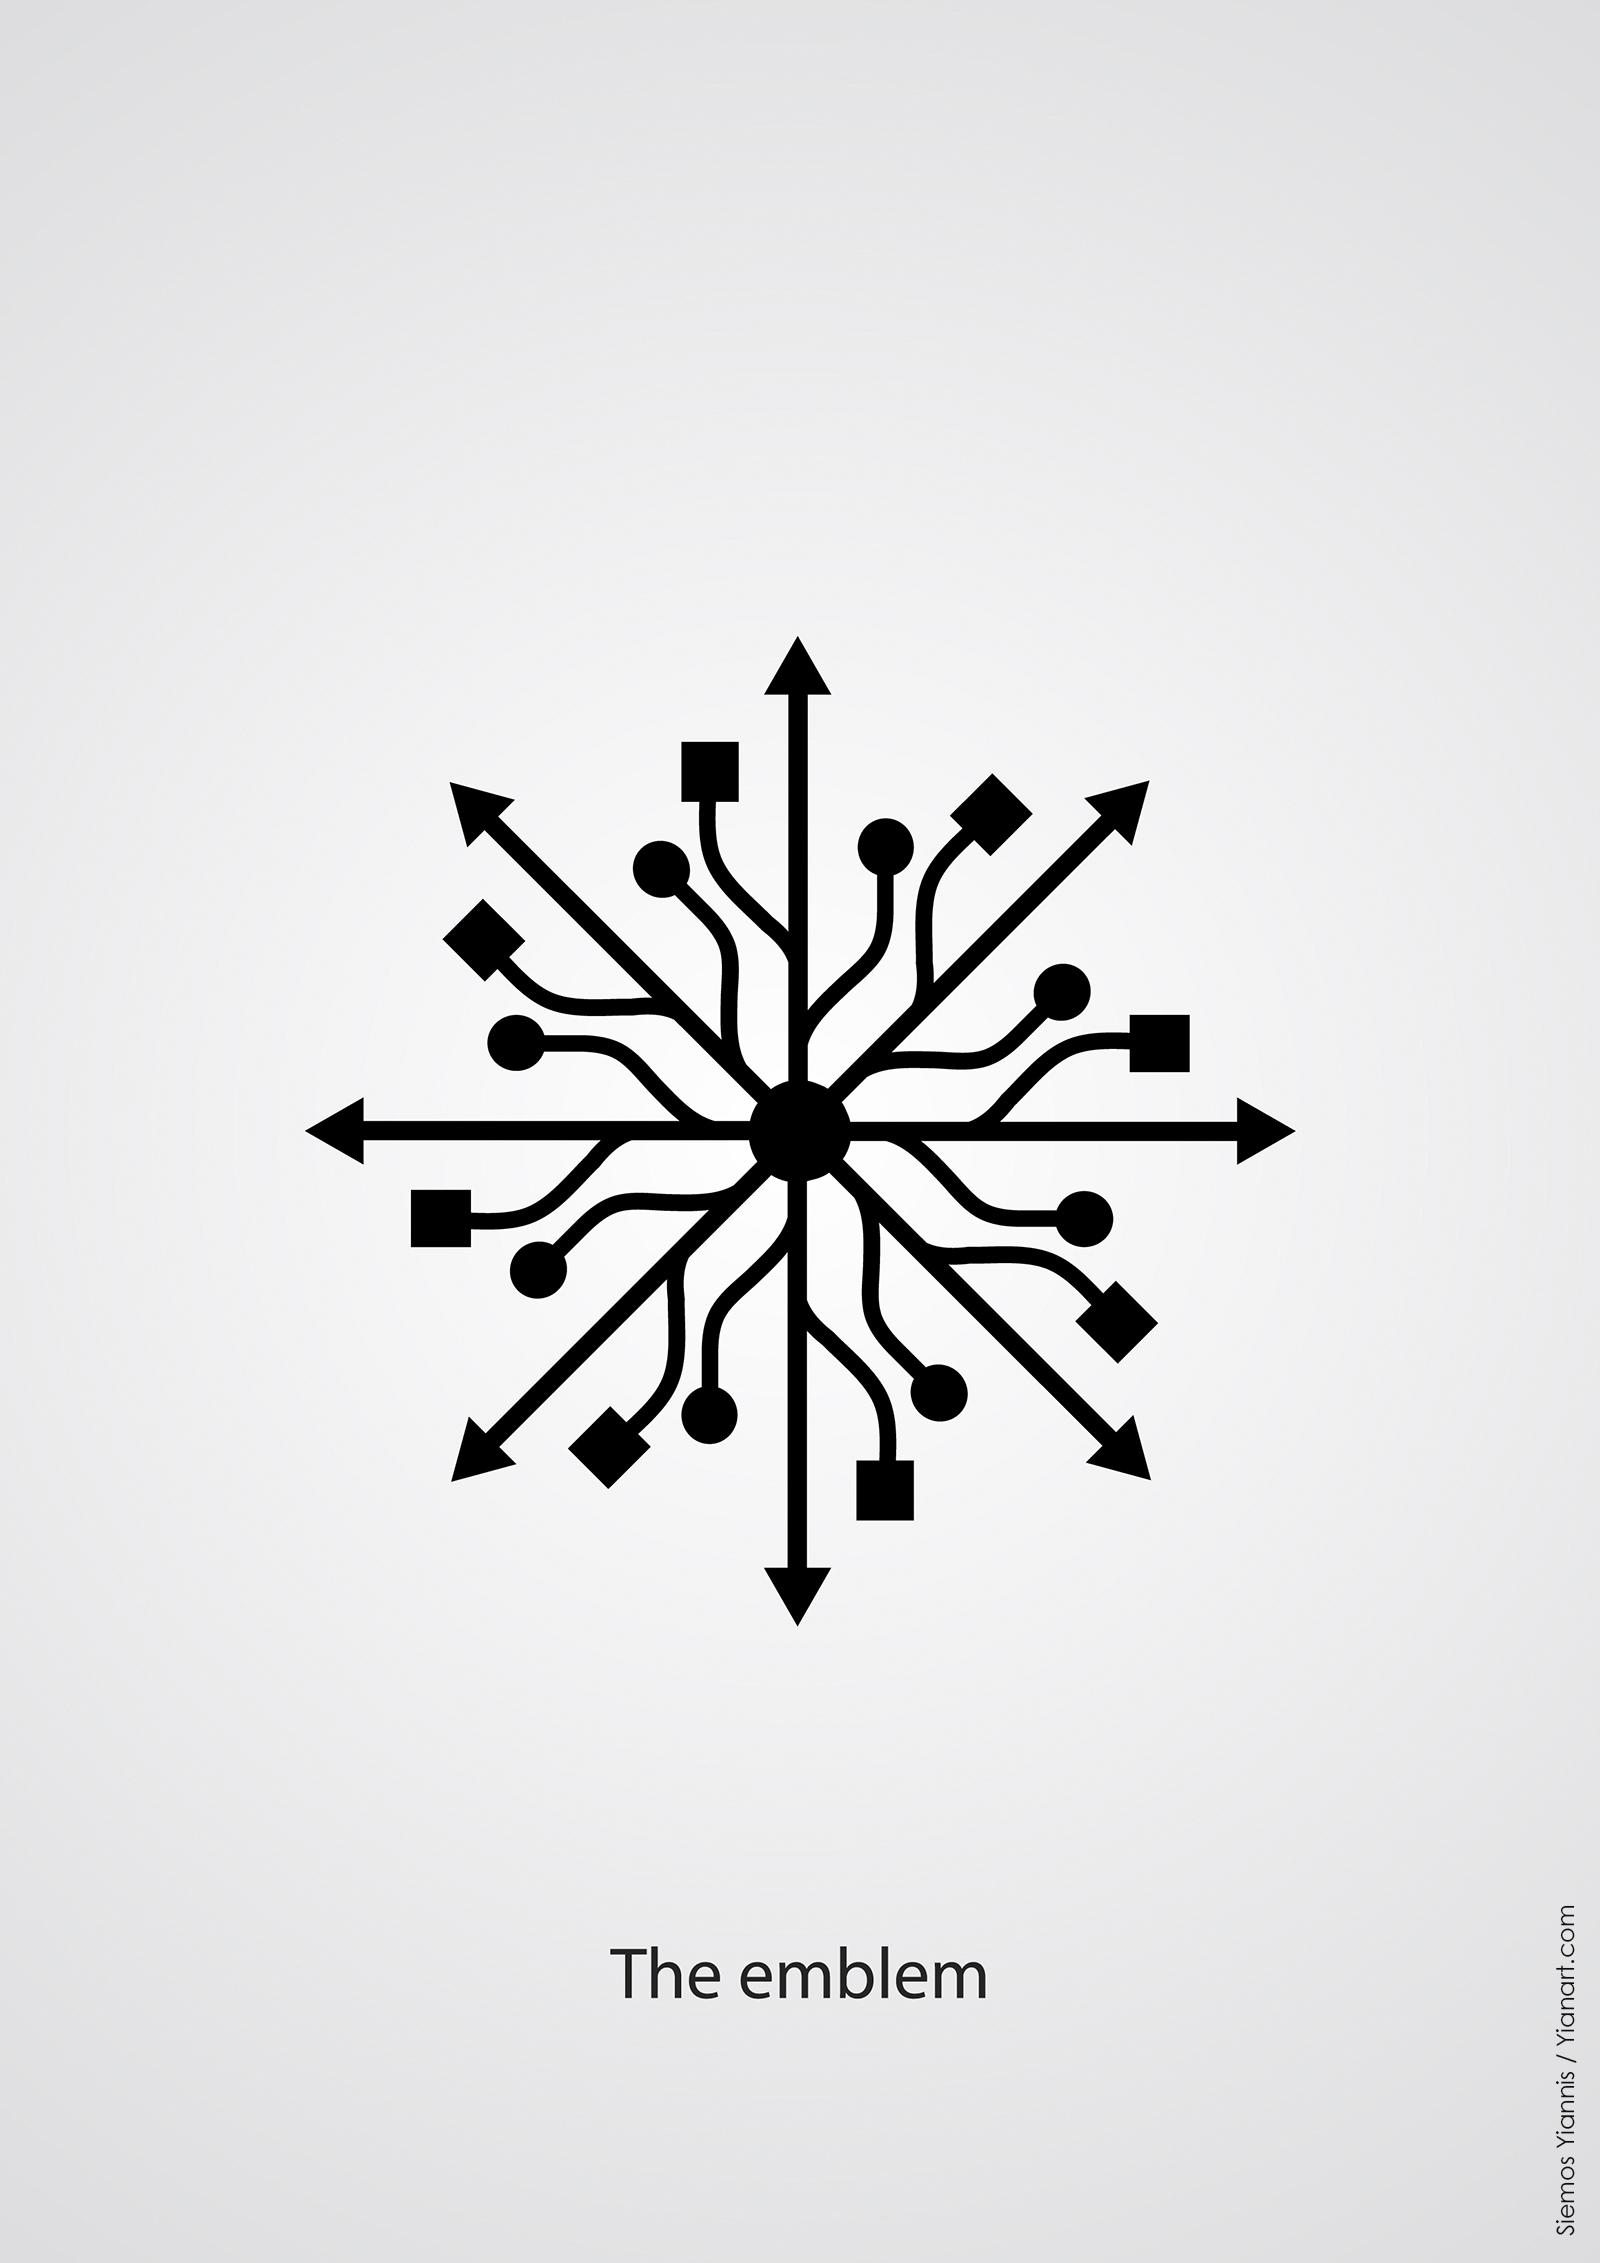 the emblem_Yianart